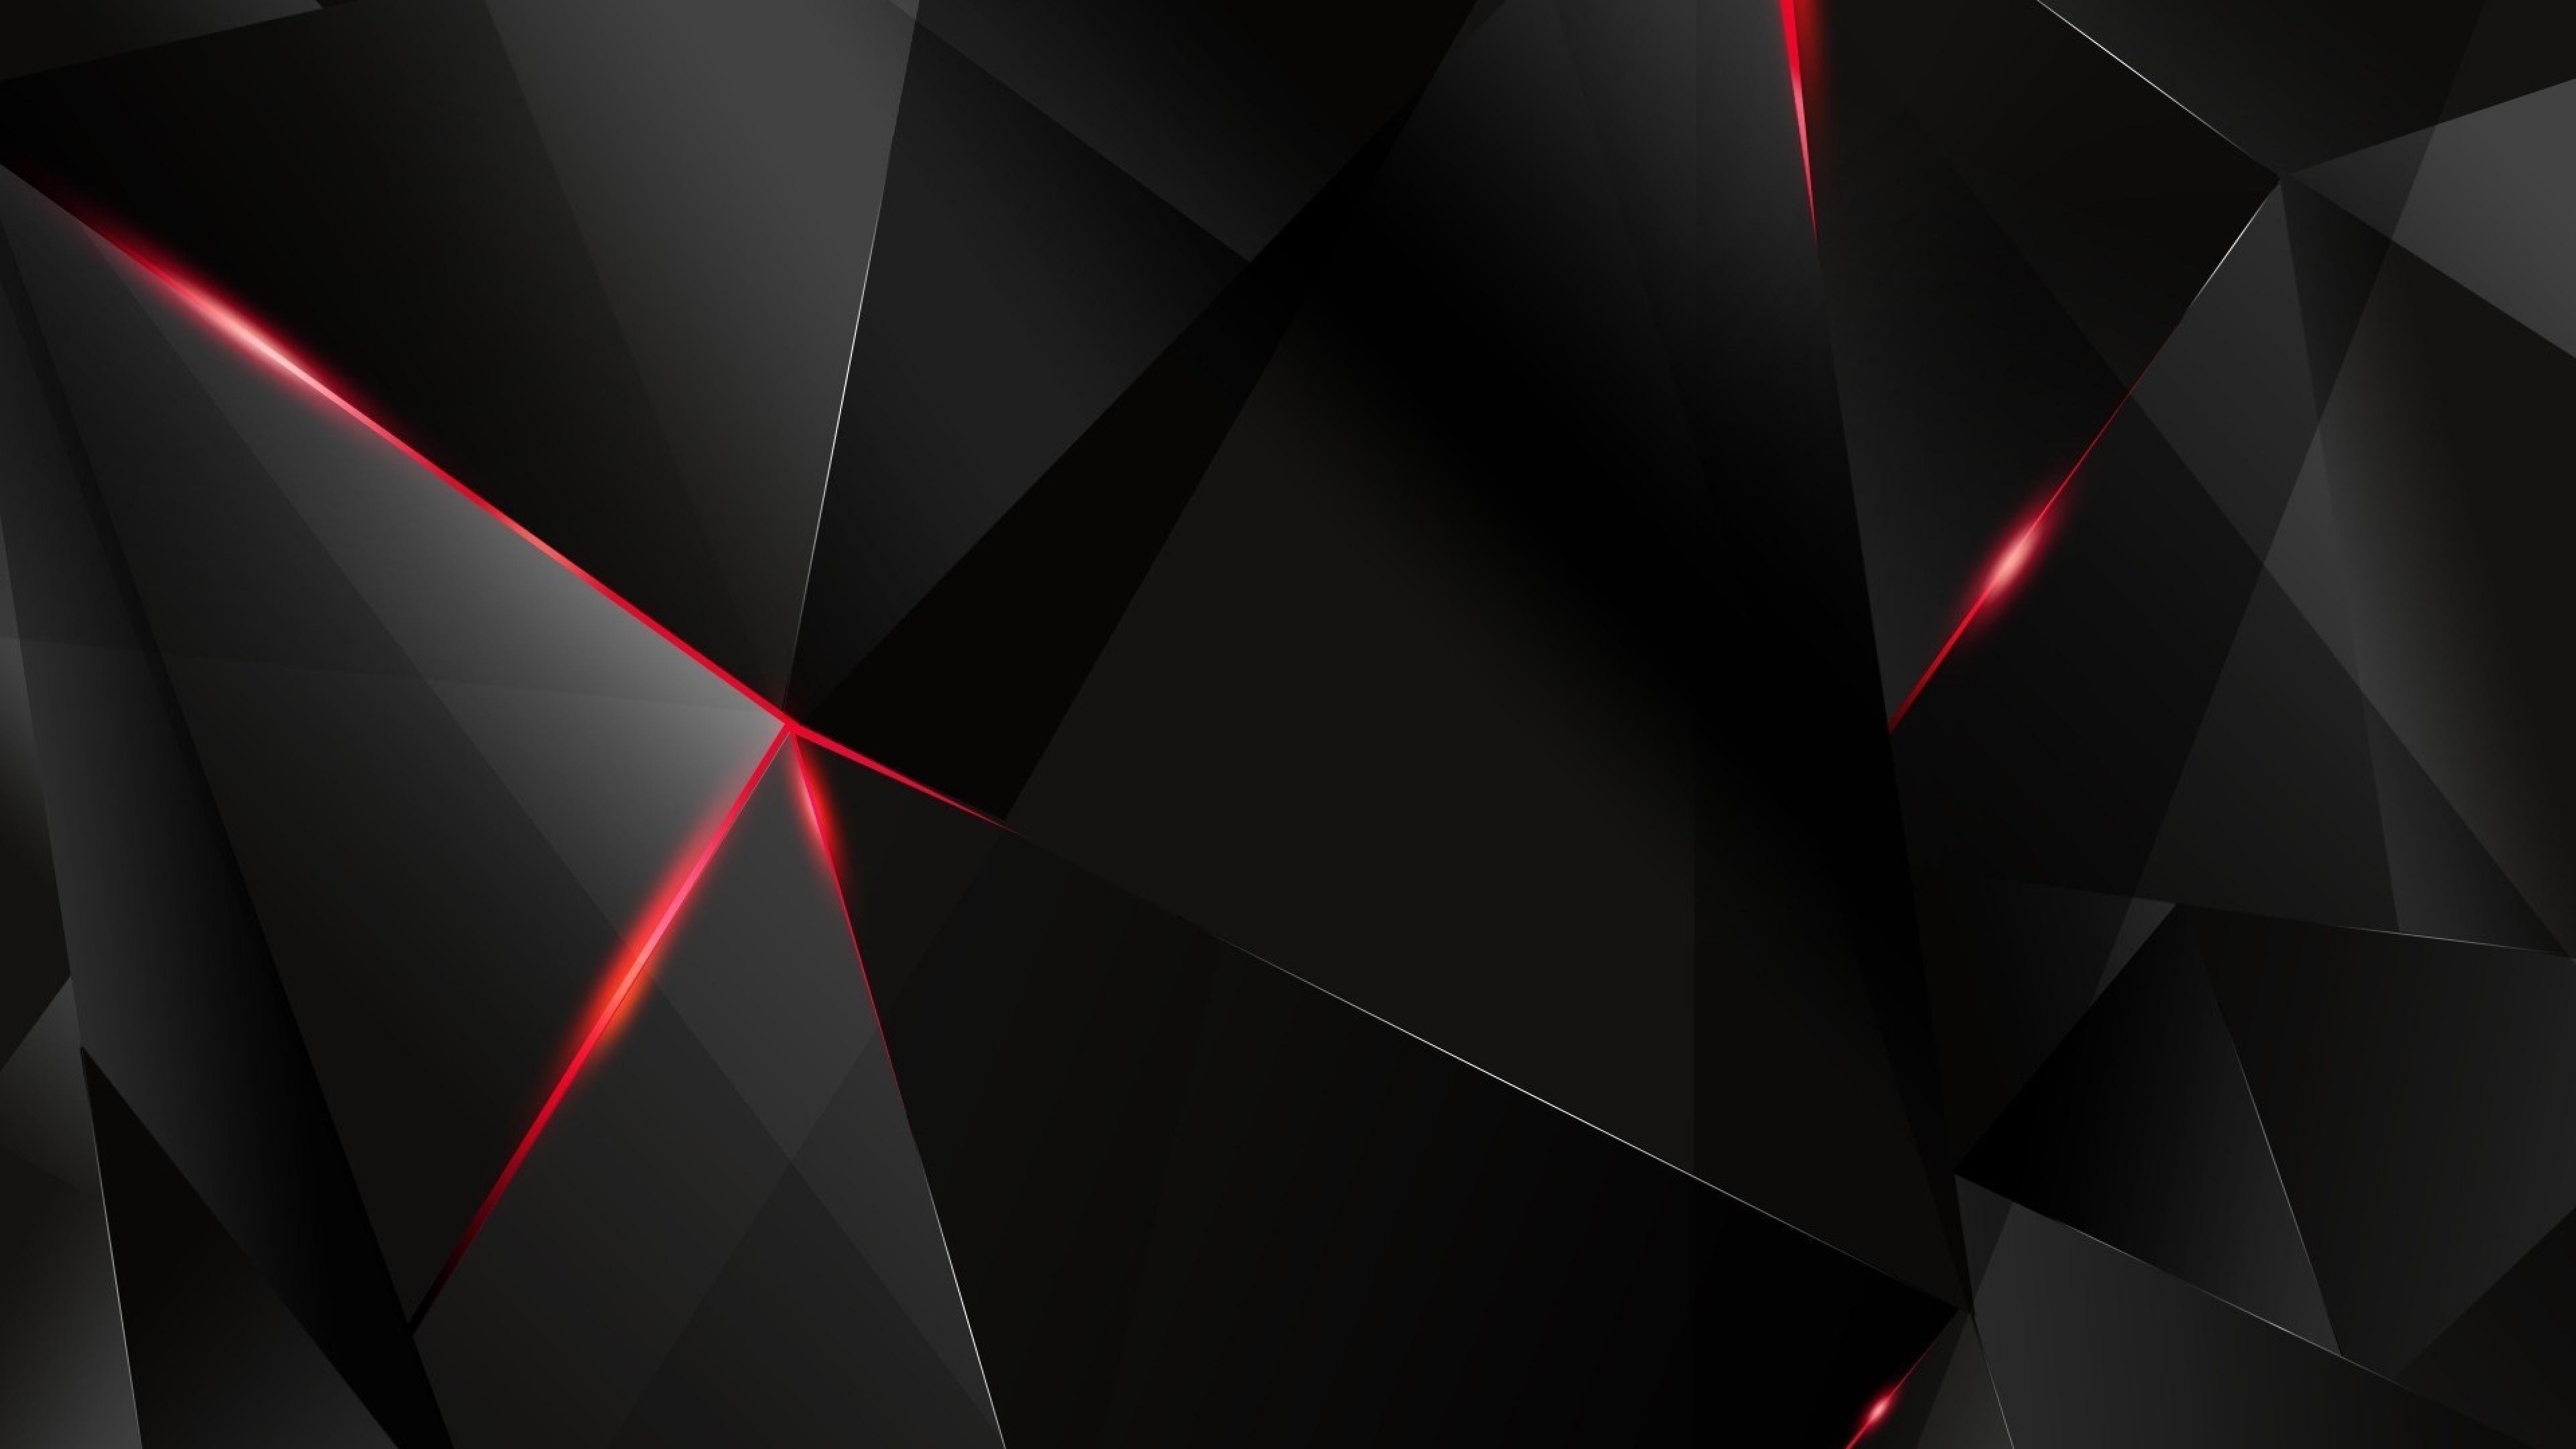 4k Ultra Hd Black Wallpapers Top Free 4k Ultra Hd Black Backgrounds Wallpaperaccess